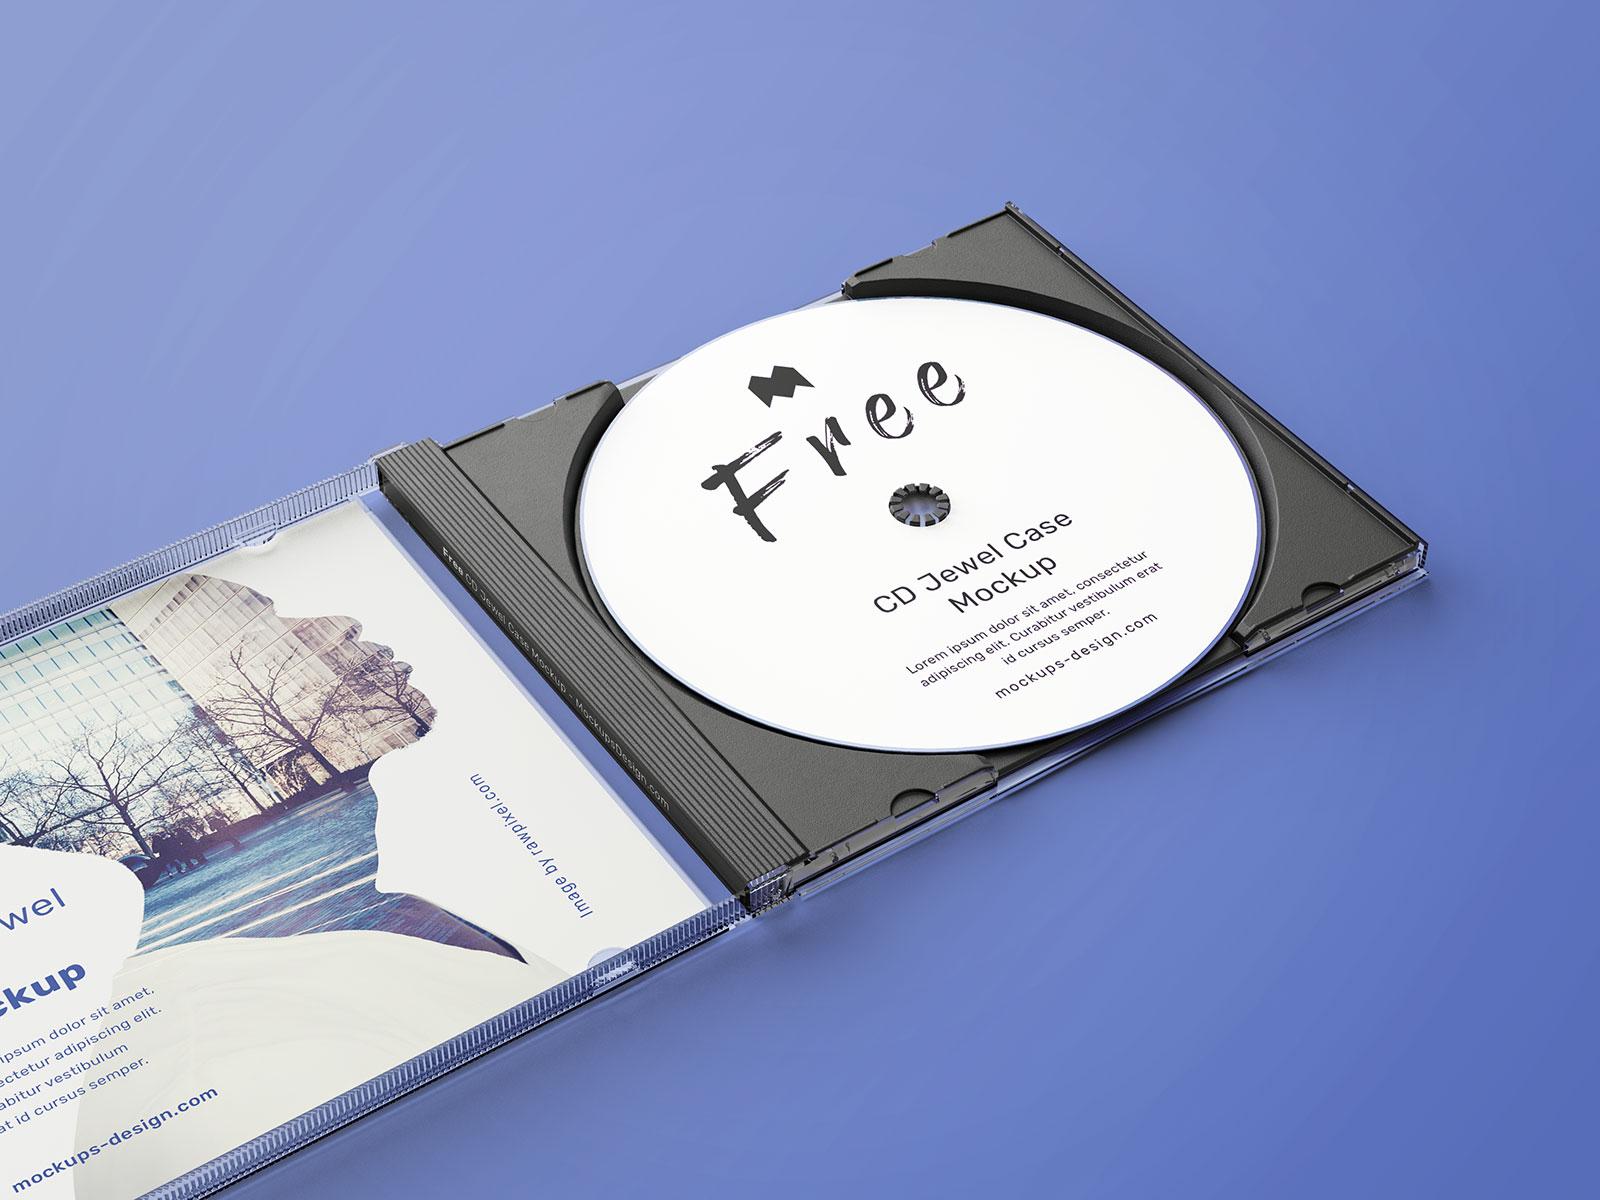 Free CD Disc Jewel Case Mockup PSD Set